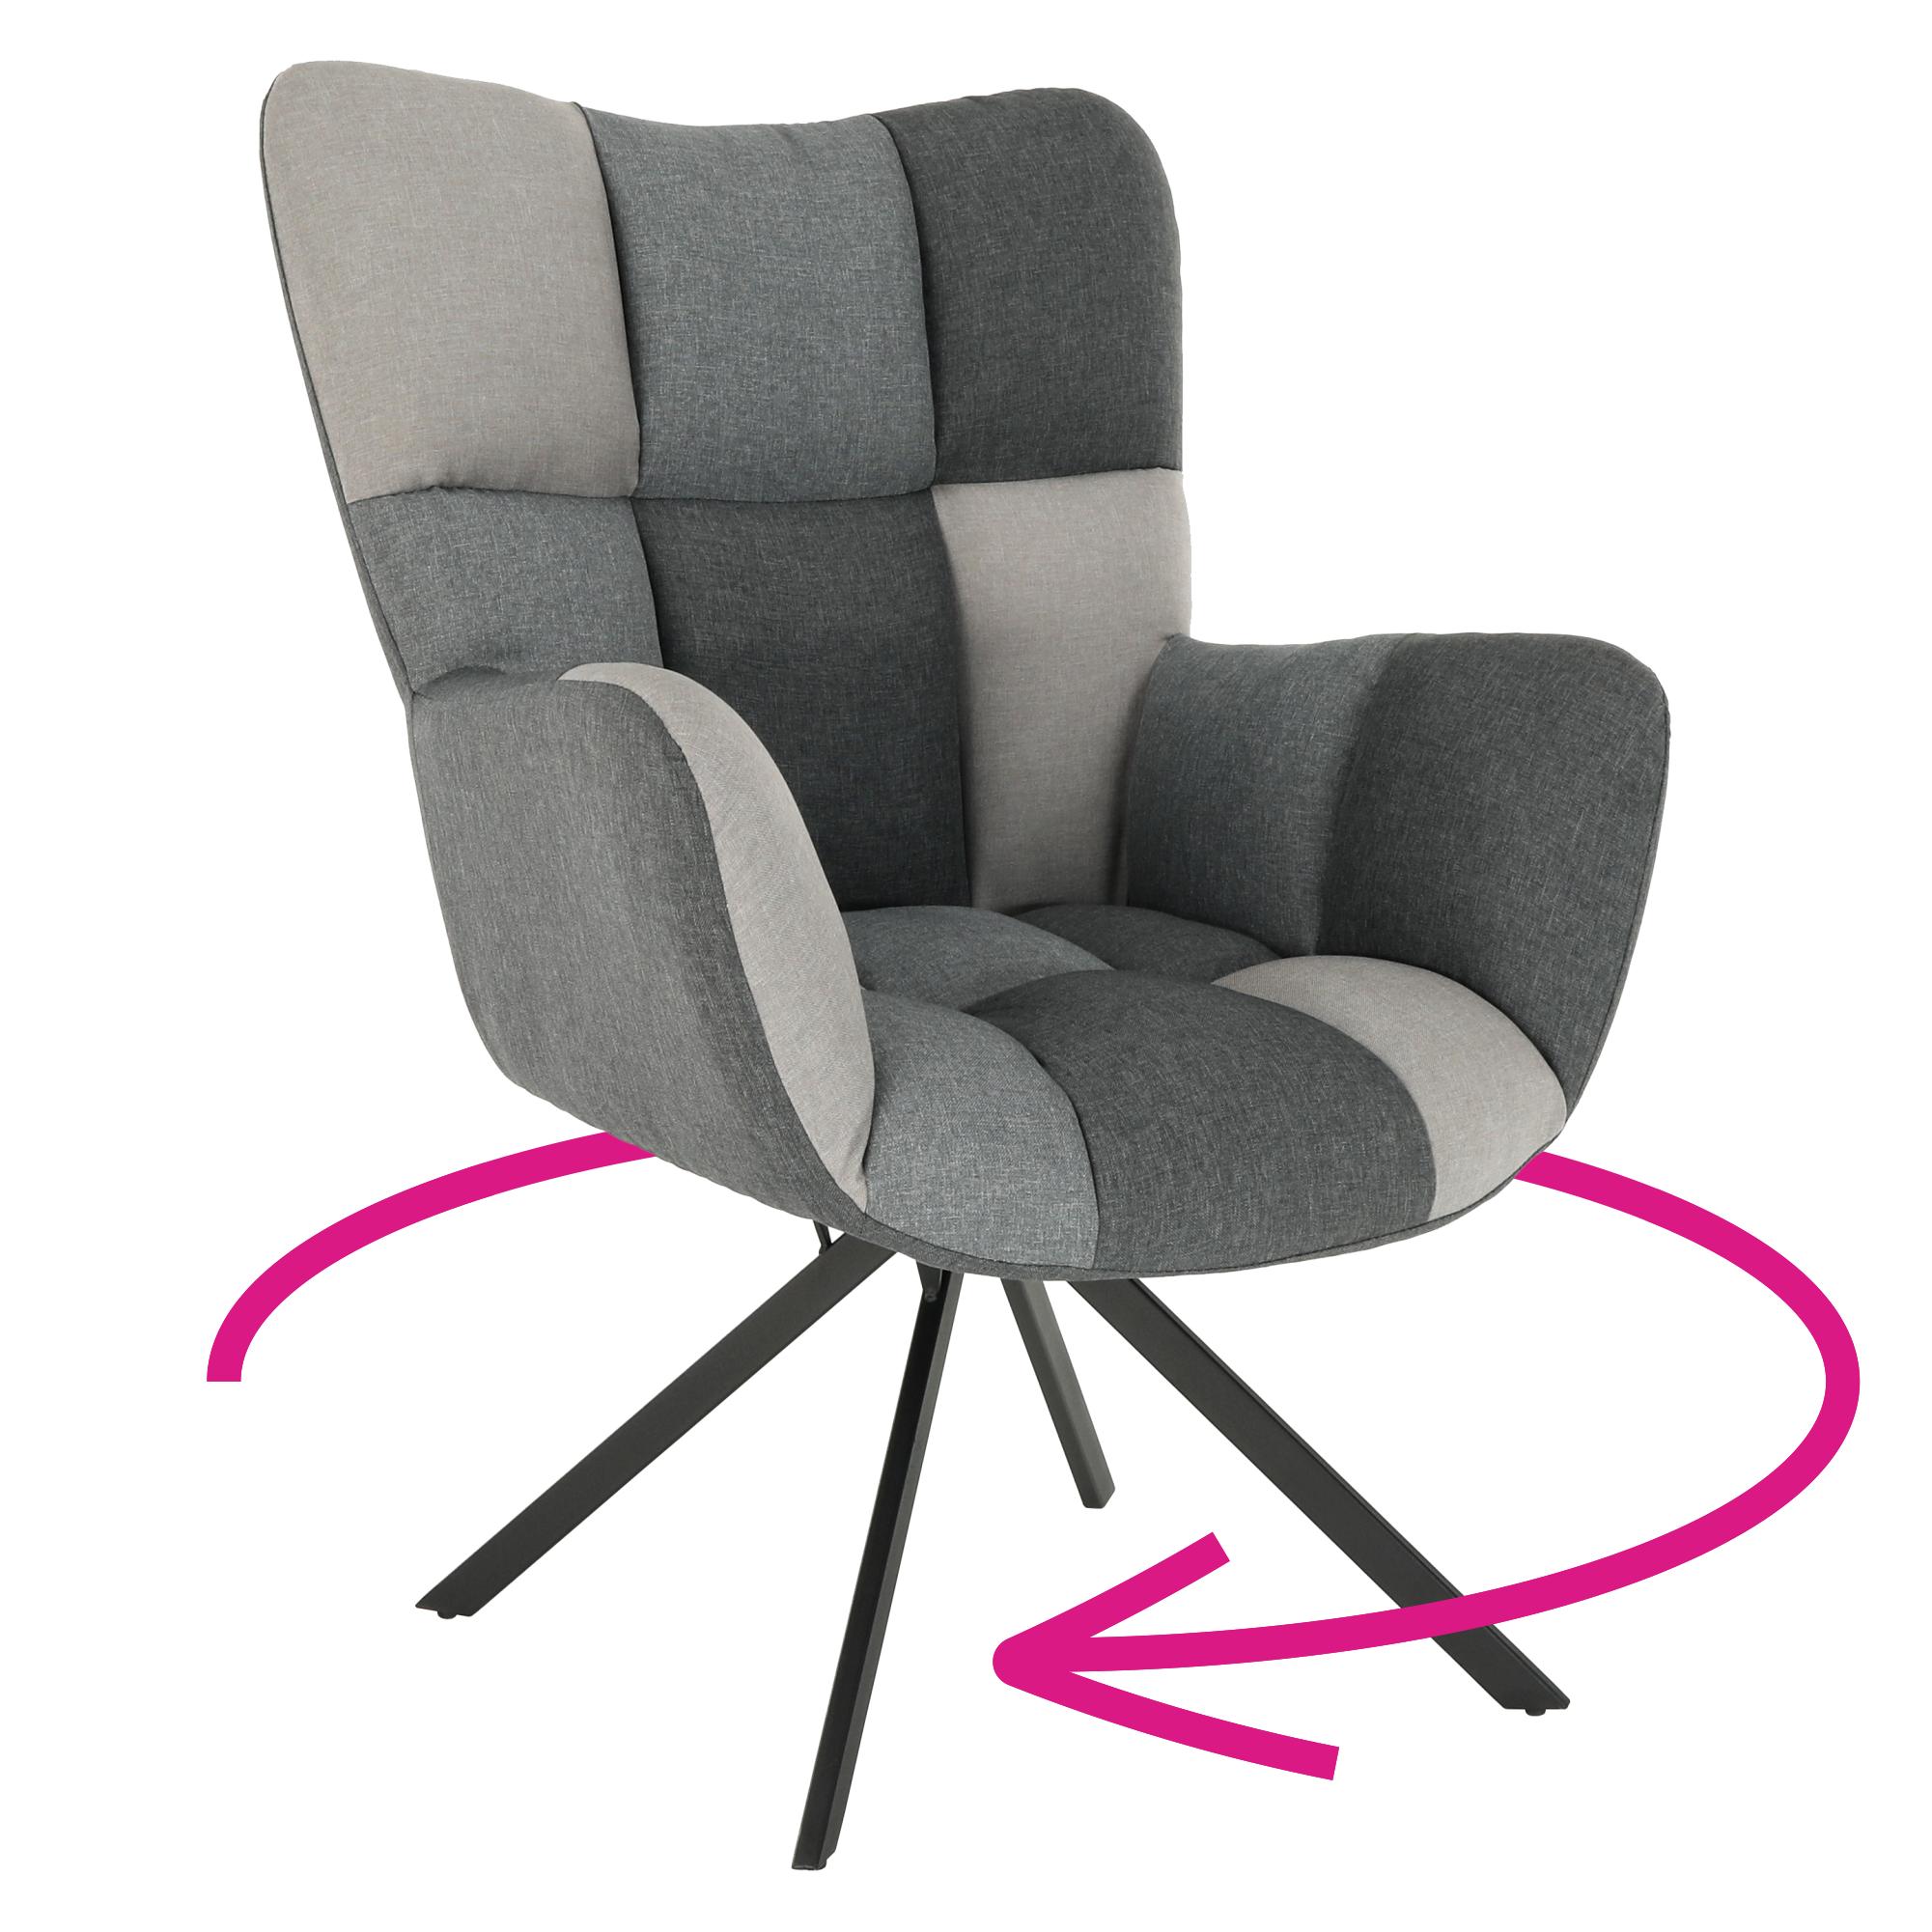 Dizájnos forgó fotel, patchwork/fekete, KOMODO